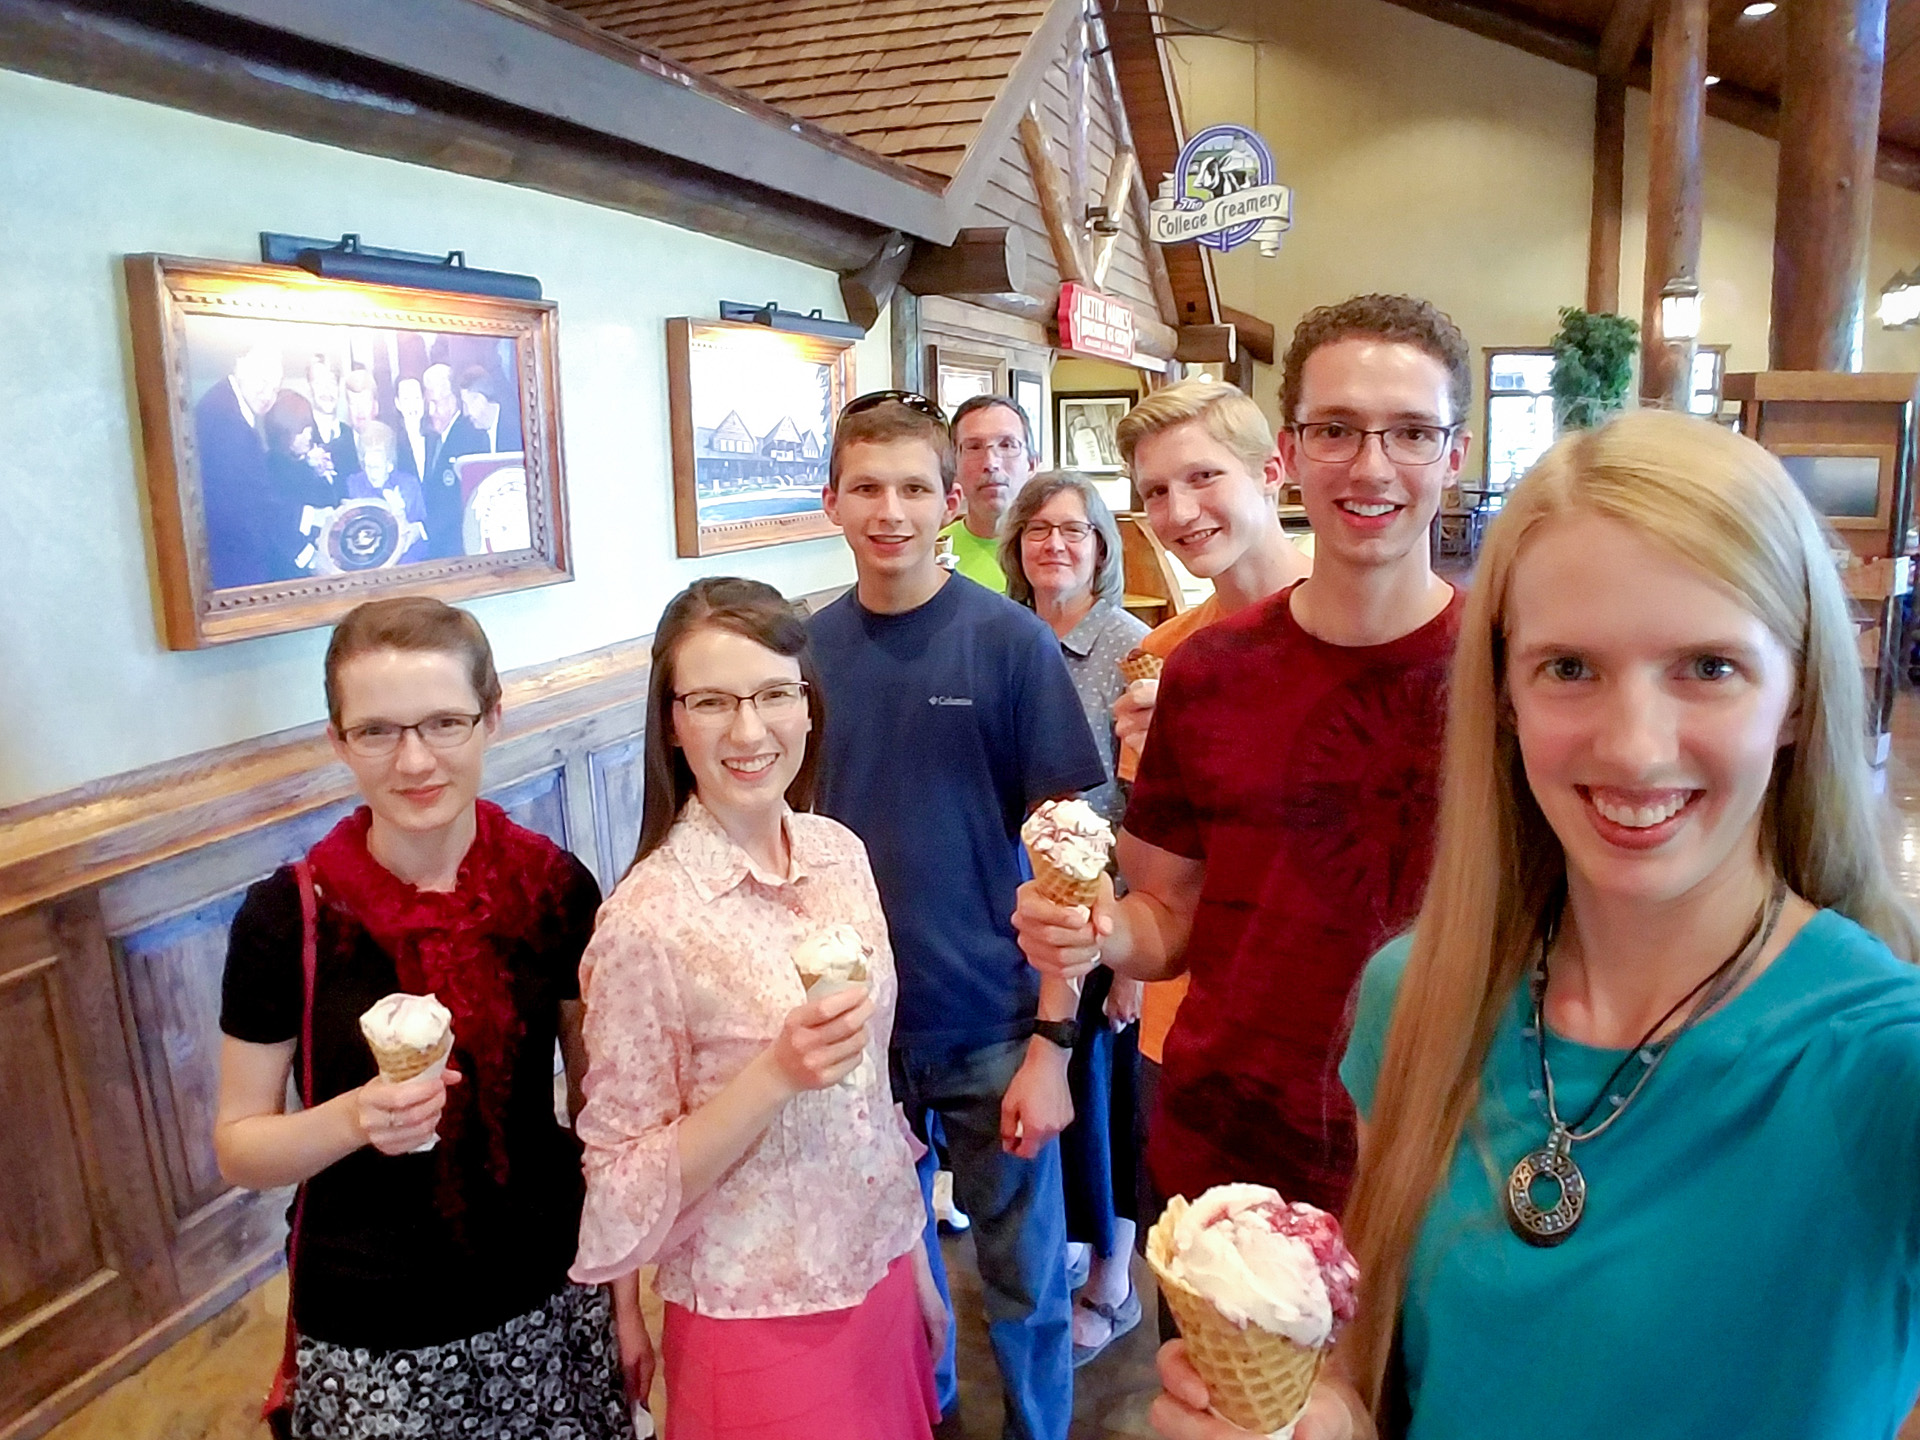 College Creamery Keeter Center Ice Cream Branson MO (2).jpg